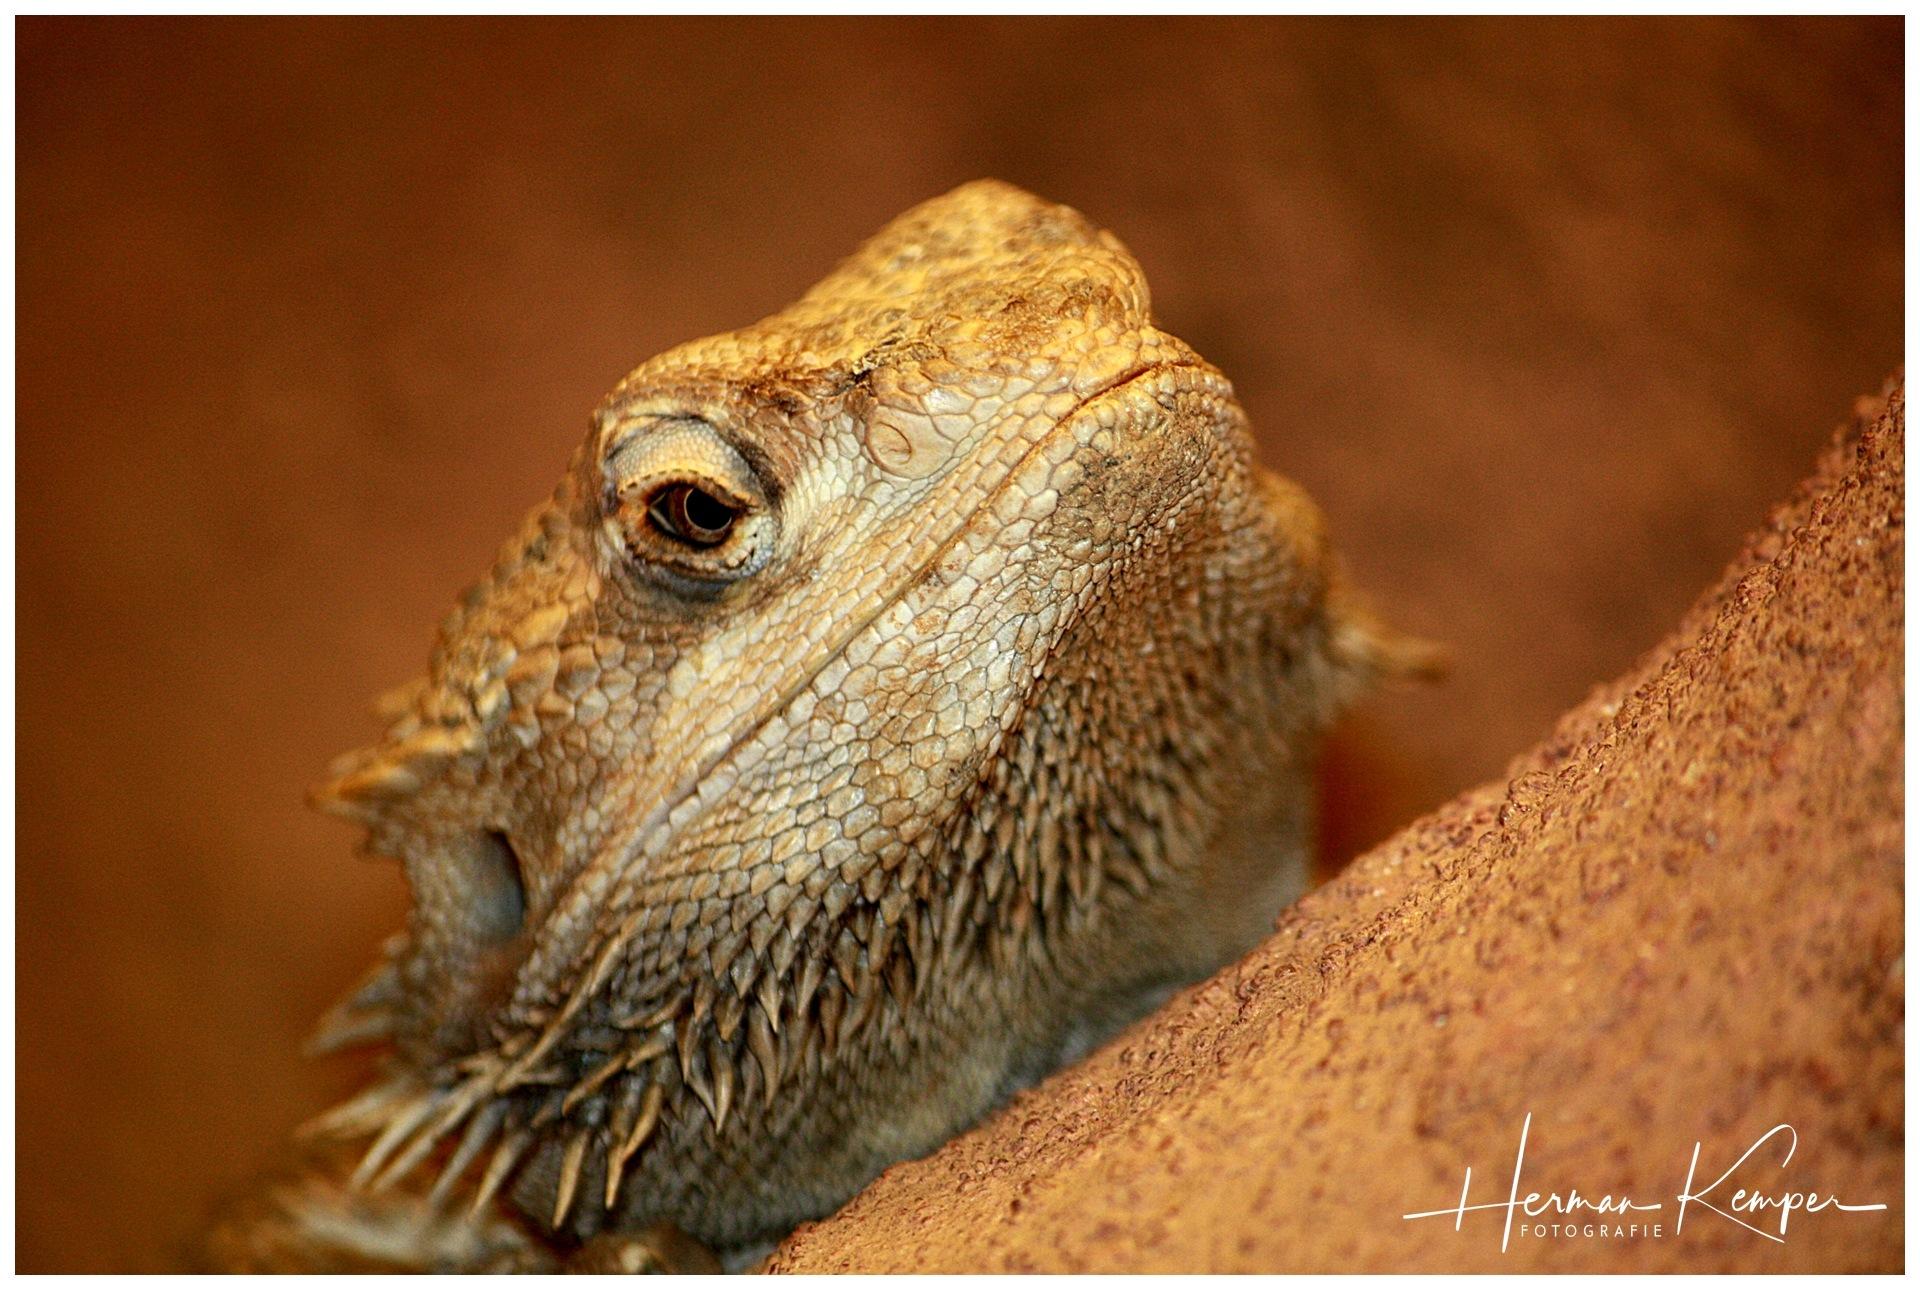 Leguaan, reptile by Shoot-by-Herman